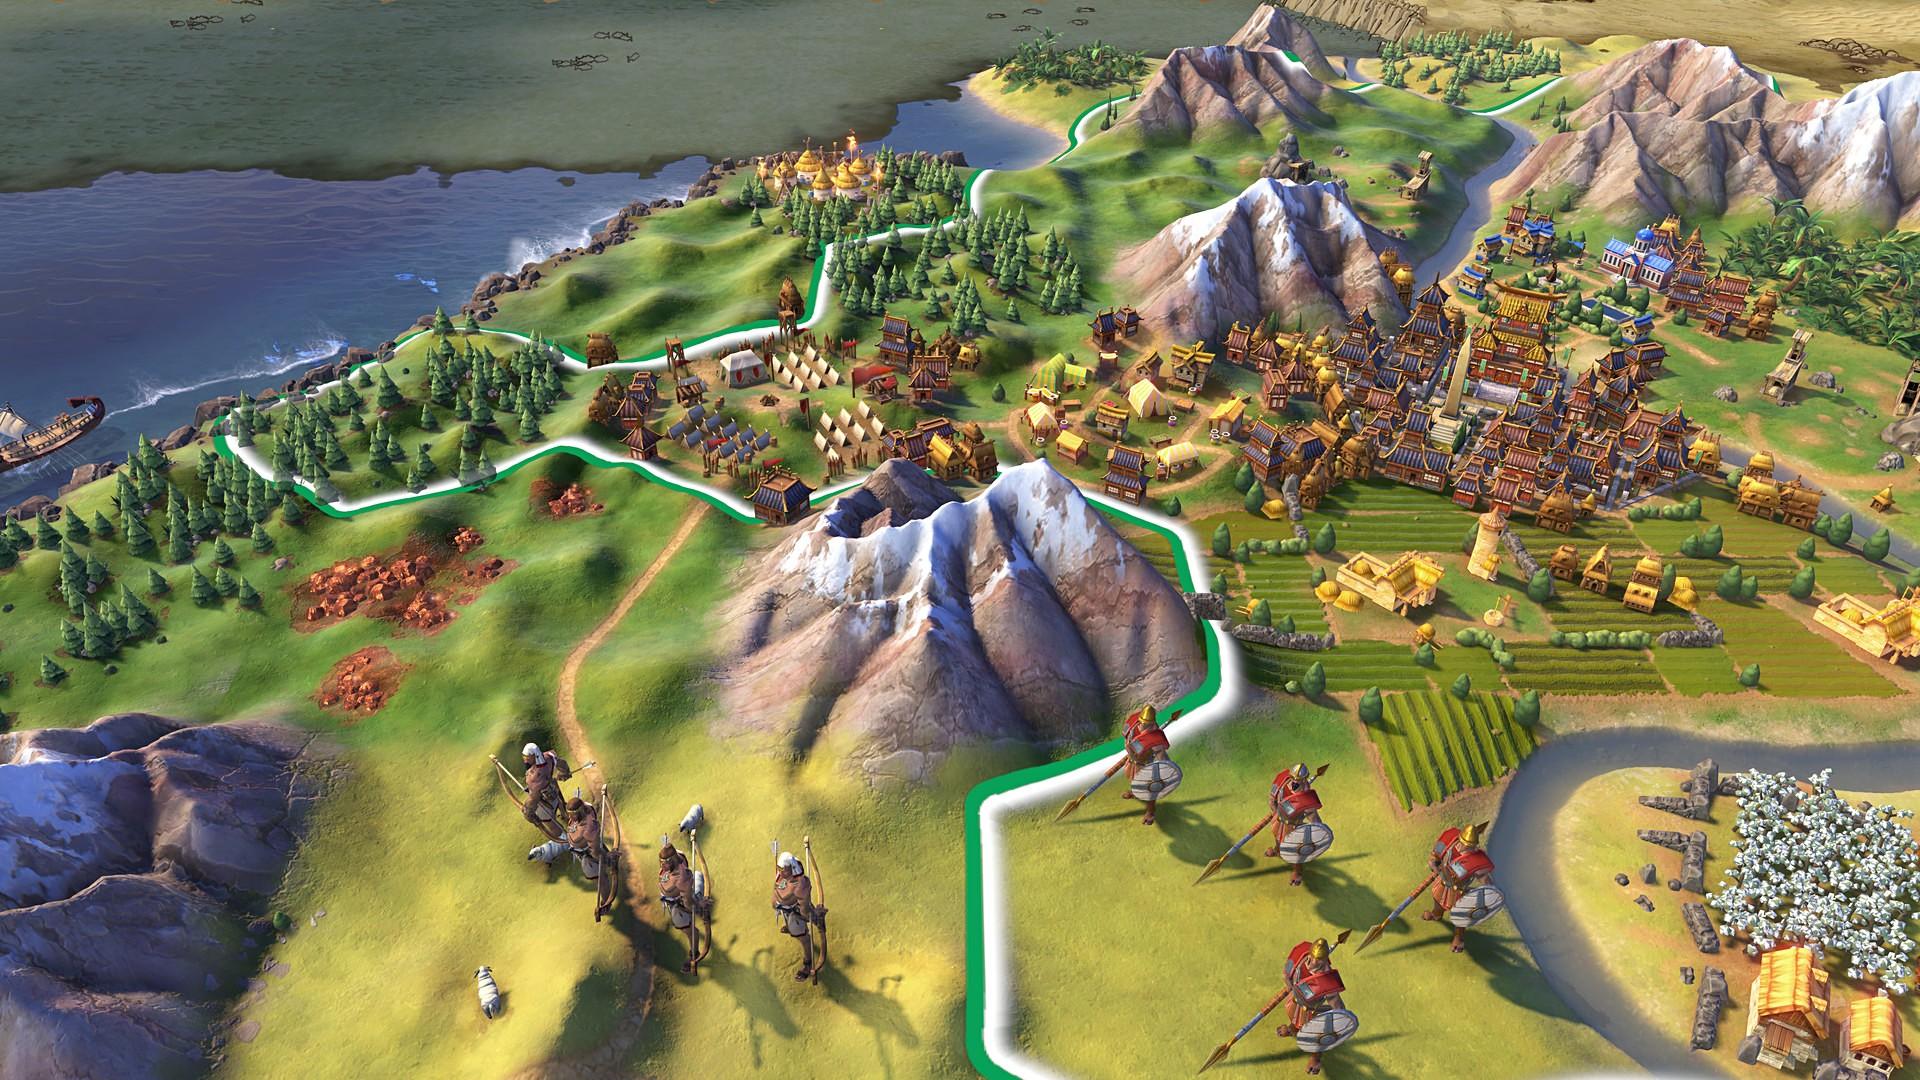 Civilization VI updated to Version 1.2.1